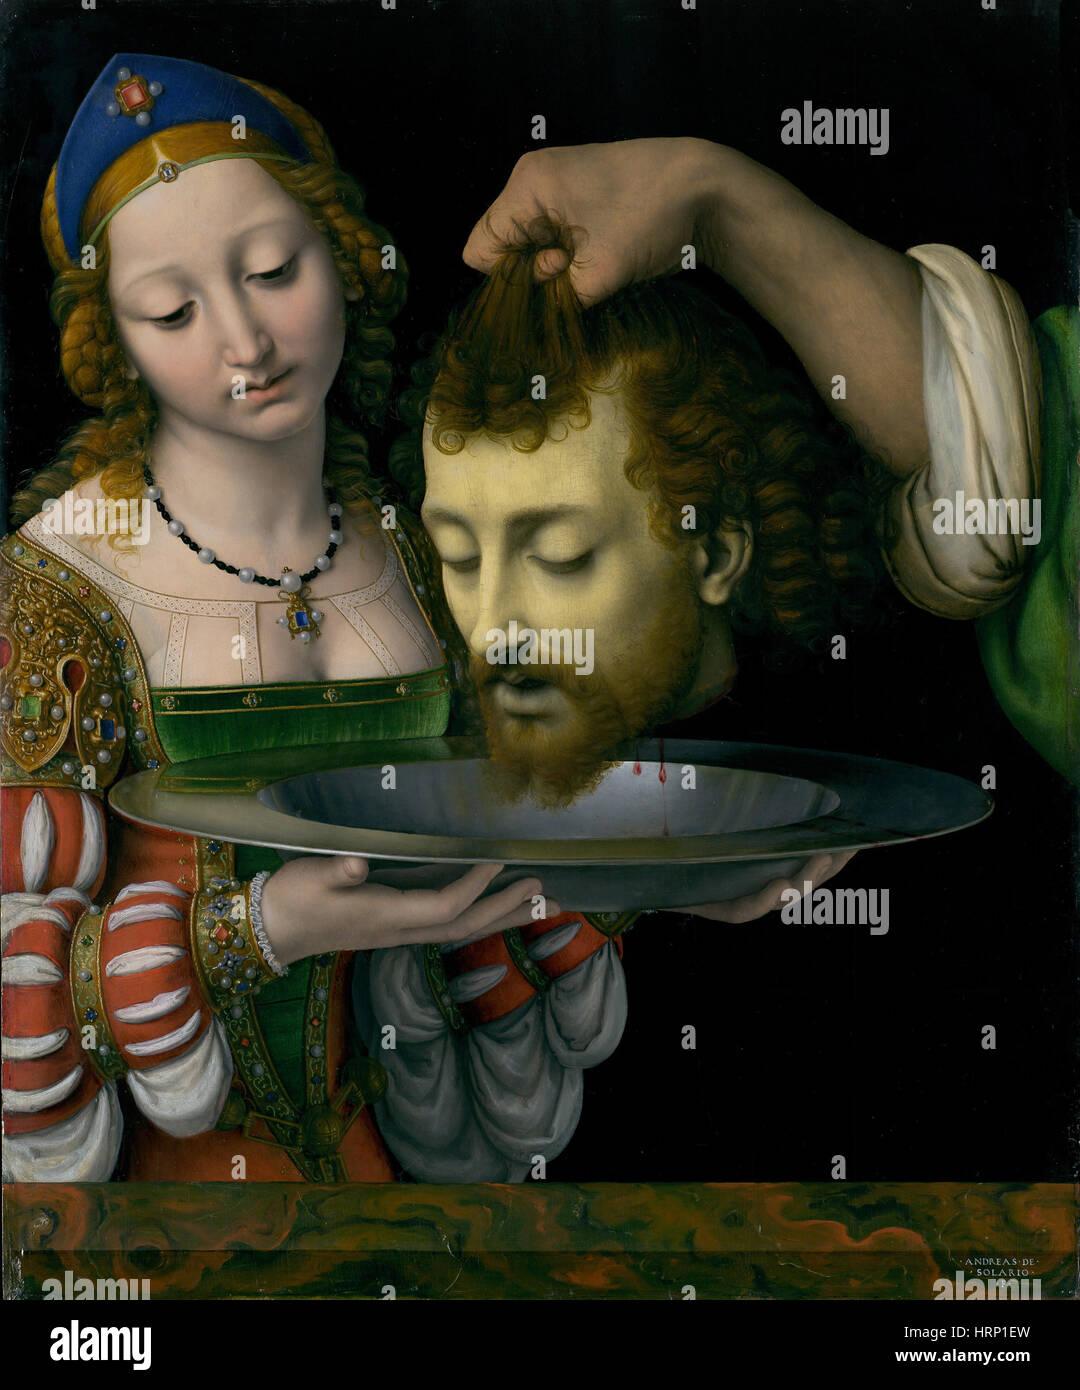 Salome with the Head of Saint John the Baptist - Stock Image